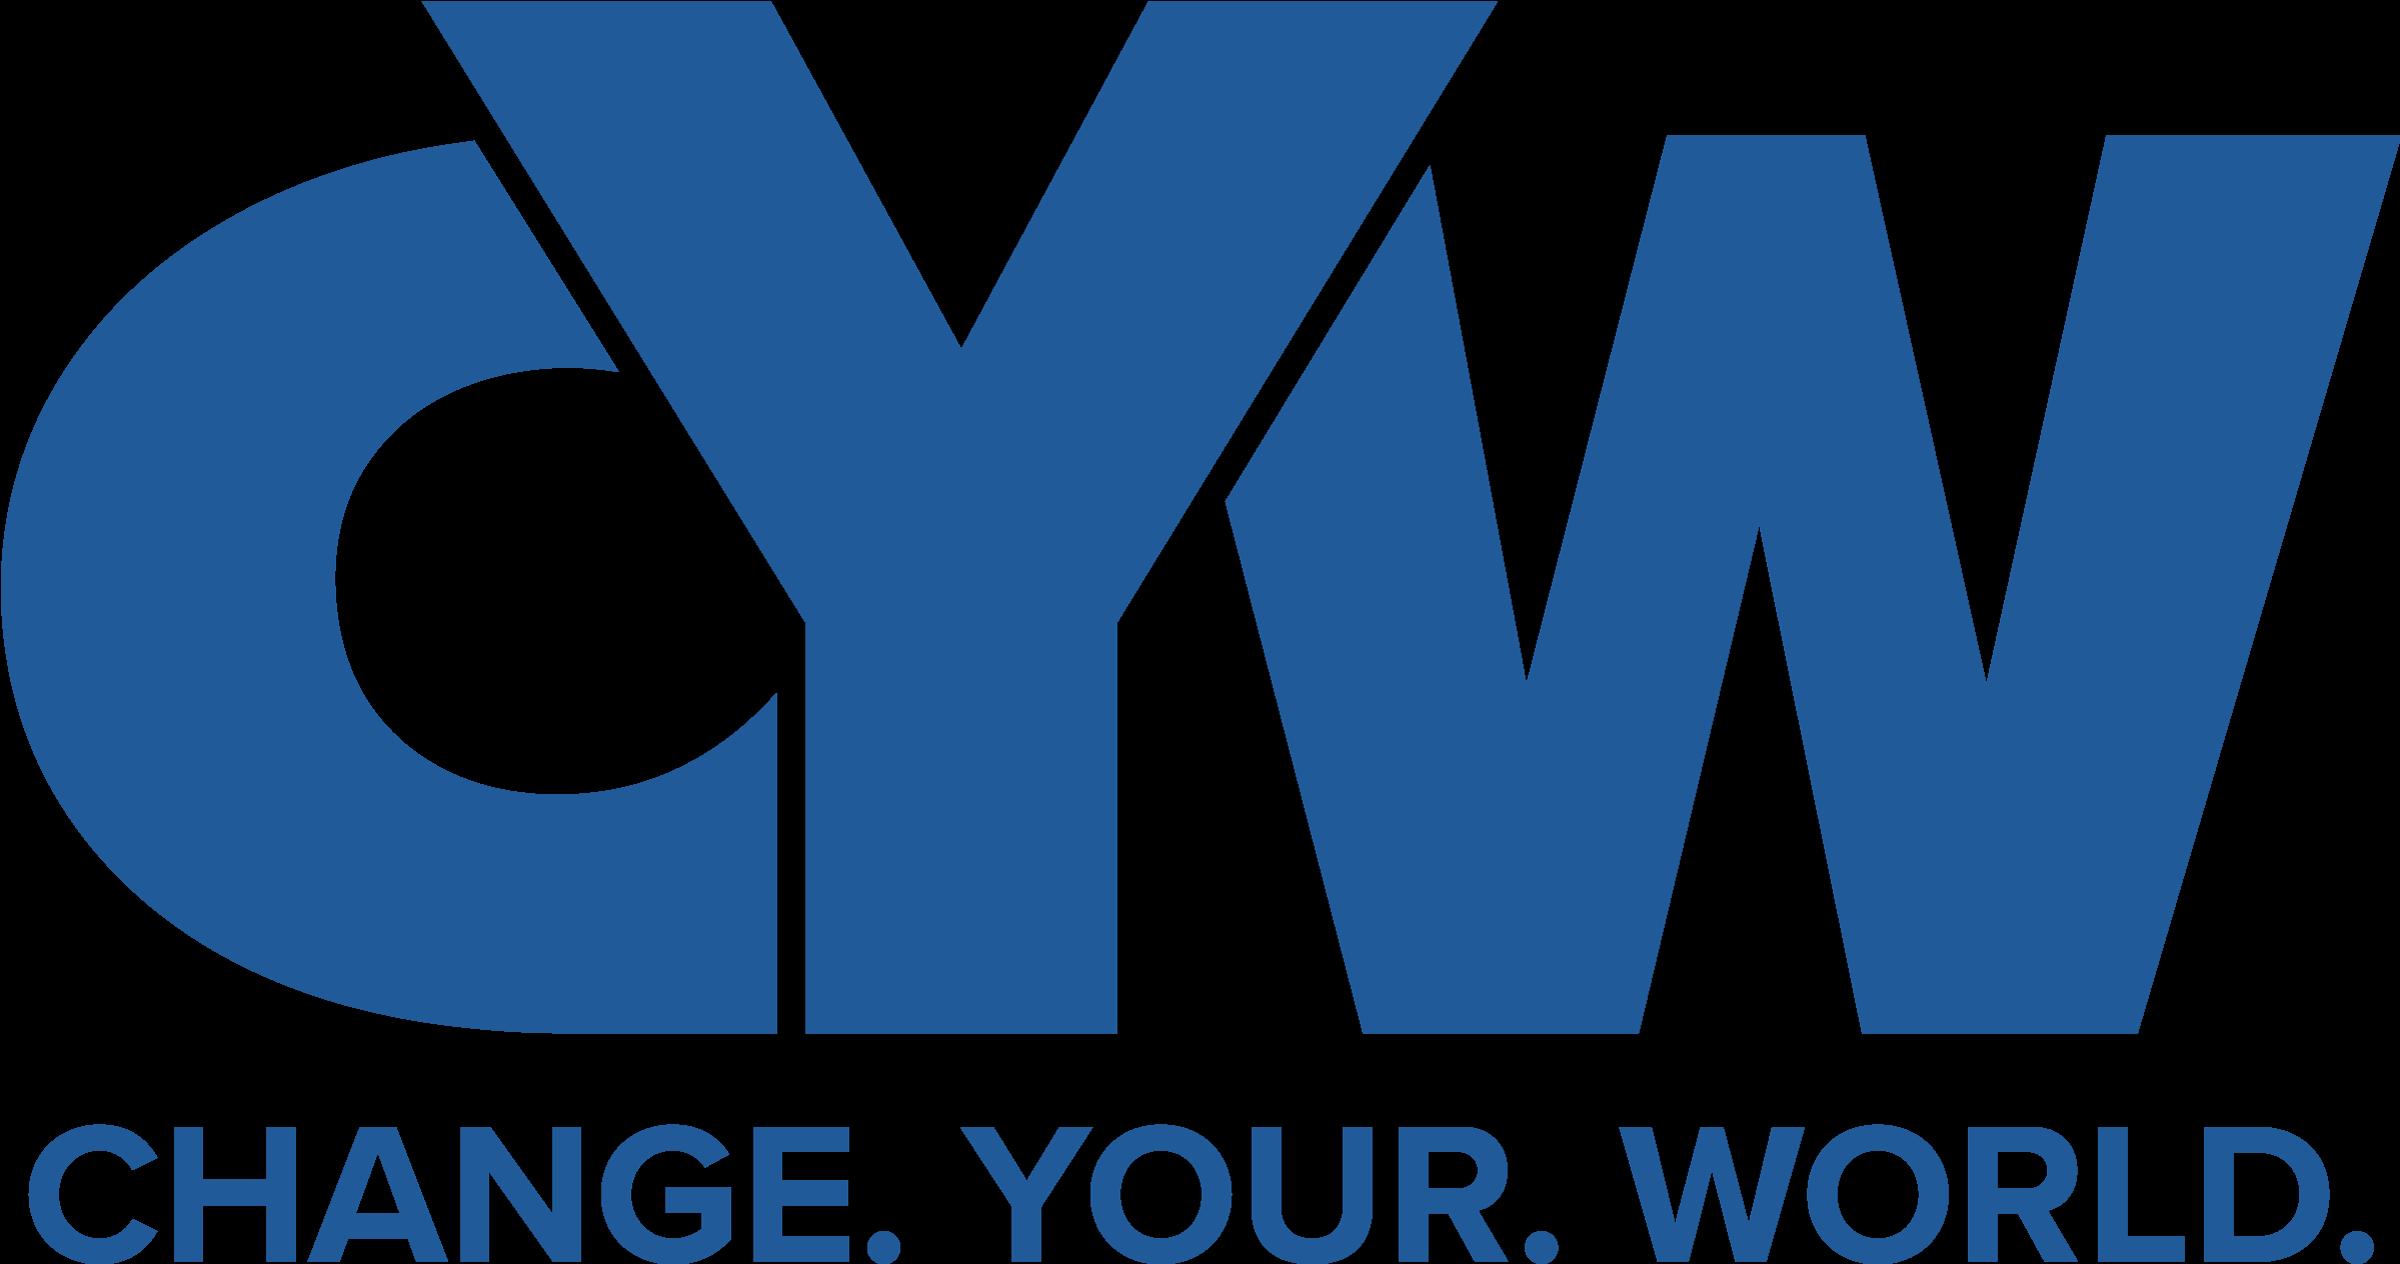 John Maxwell Leadership Foundation Inc.